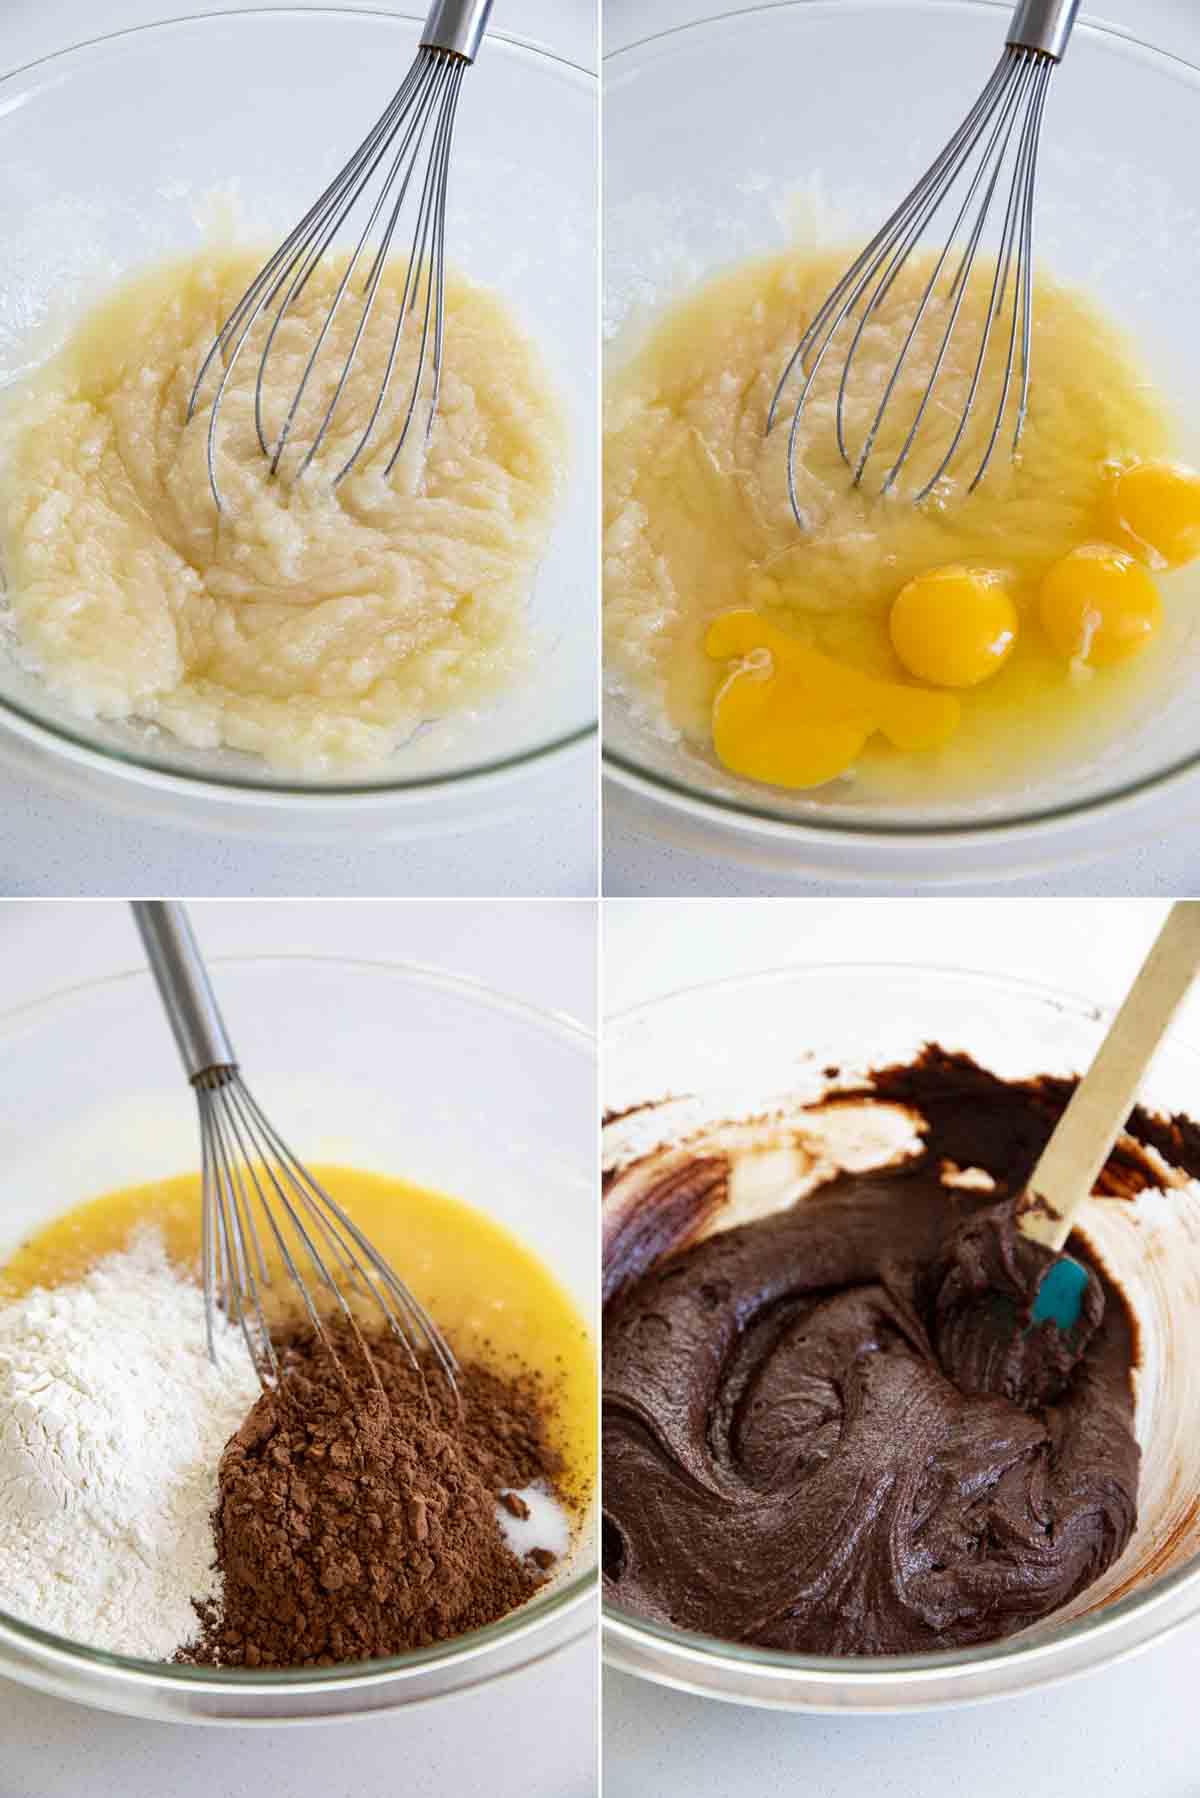 steps to make homemade brownies